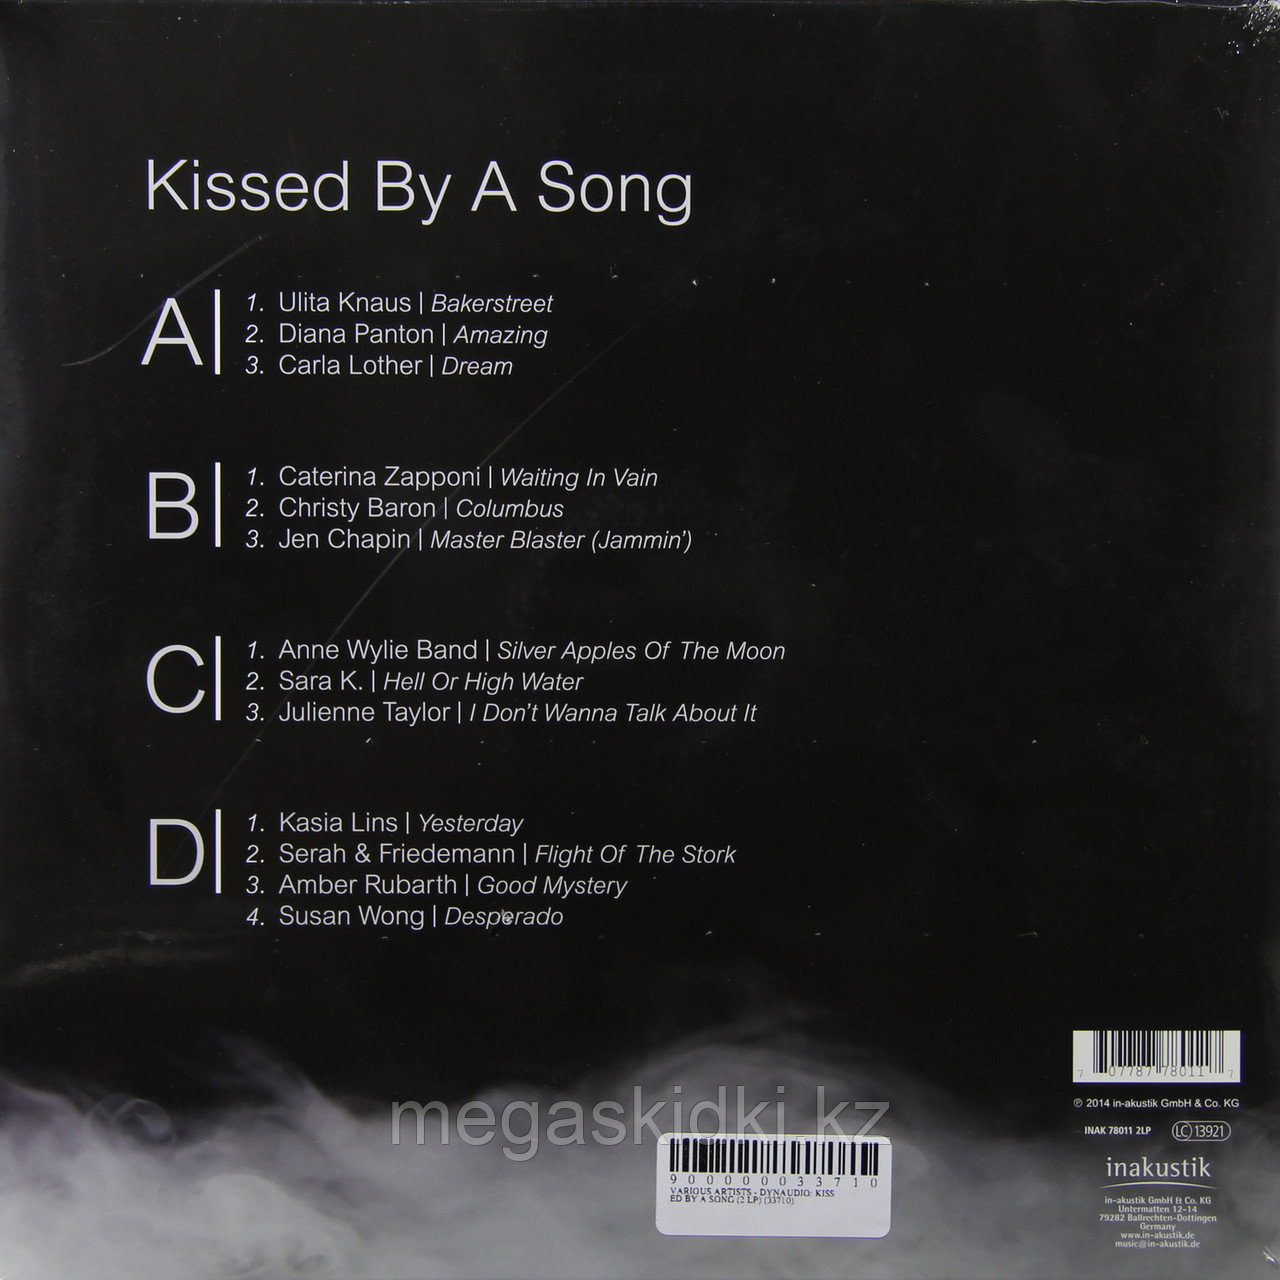 Виниловая пластинка Inakustik LP Dynaudio - Kissed By A Song (2 LP) - фото 2